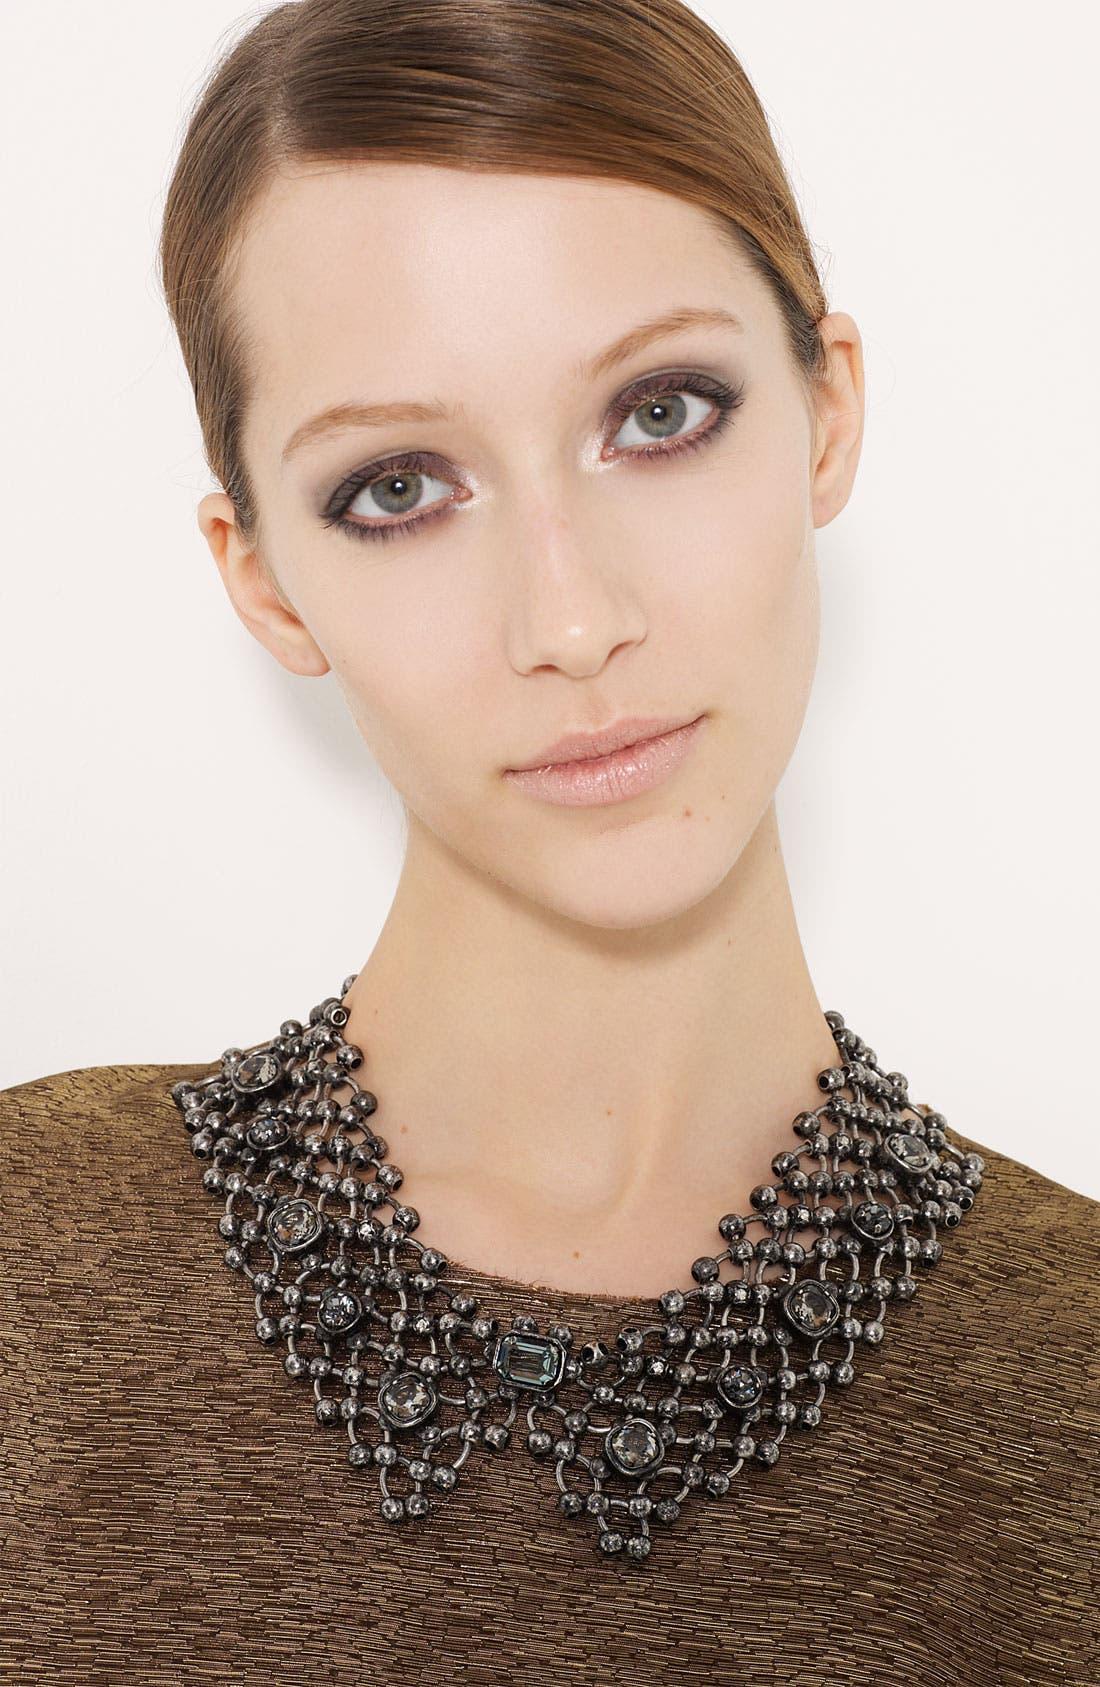 Alternate Image 1 Selected - Lanvin Côte de Maille Collar Necklace